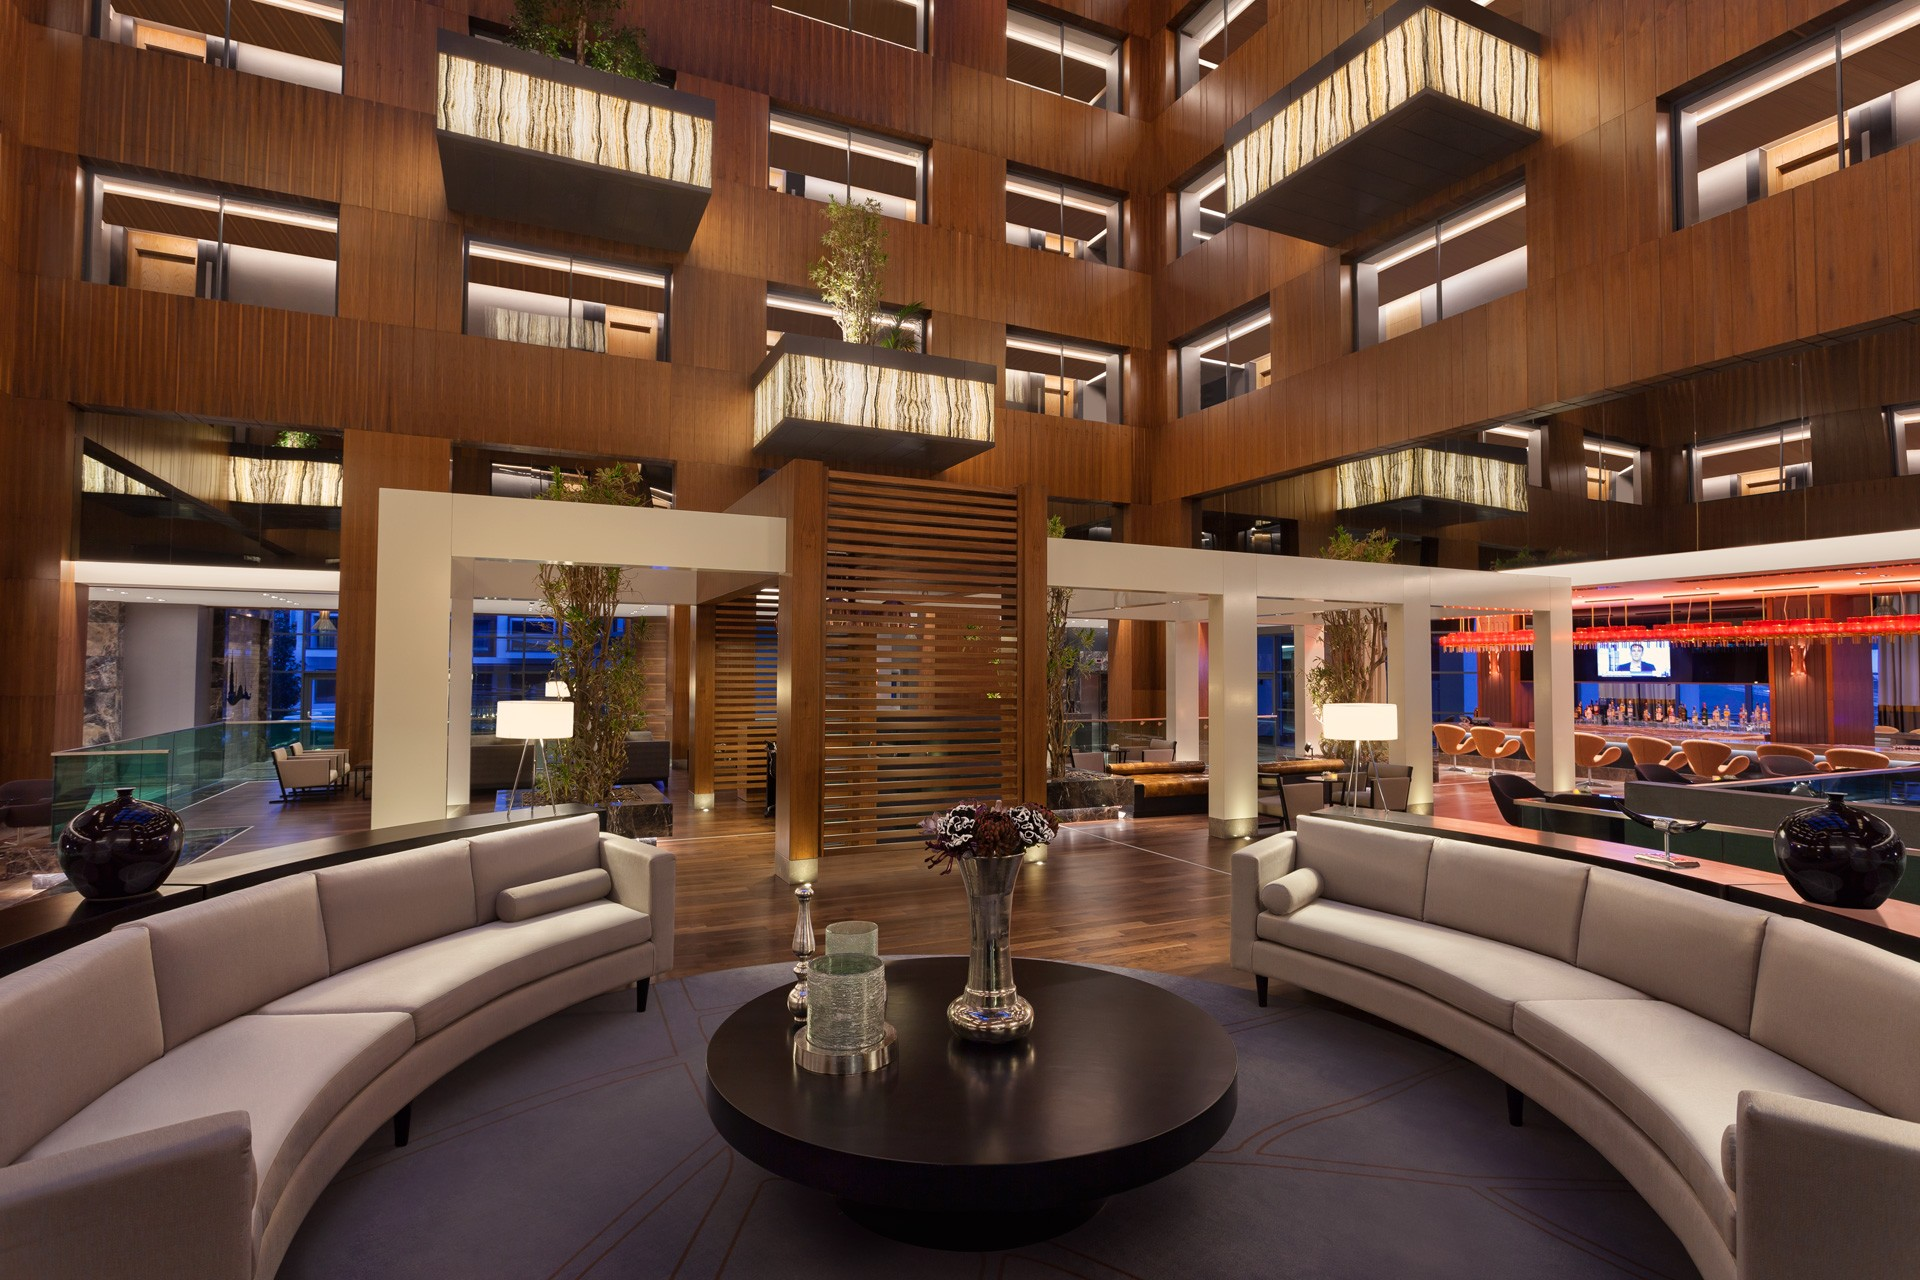 Radisson Blu Hotel Tuzla | Lobby